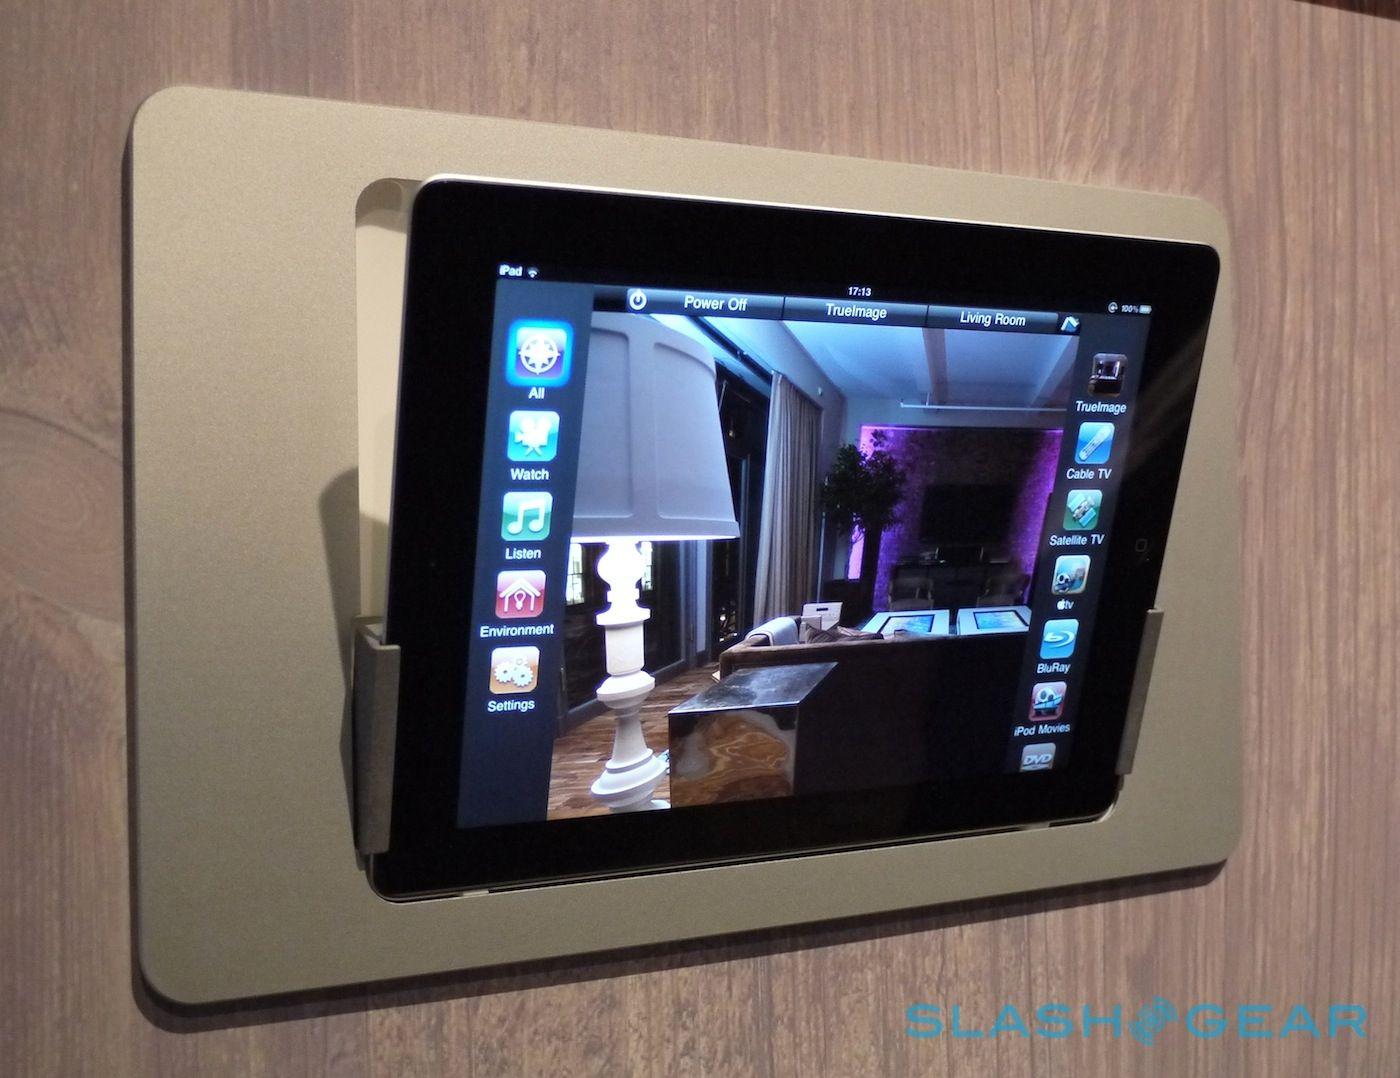 Thinkflood In Wall Ipad Dock 3 Jpg 1400 1078 Wall Tablet Home Technology Smart Home Security